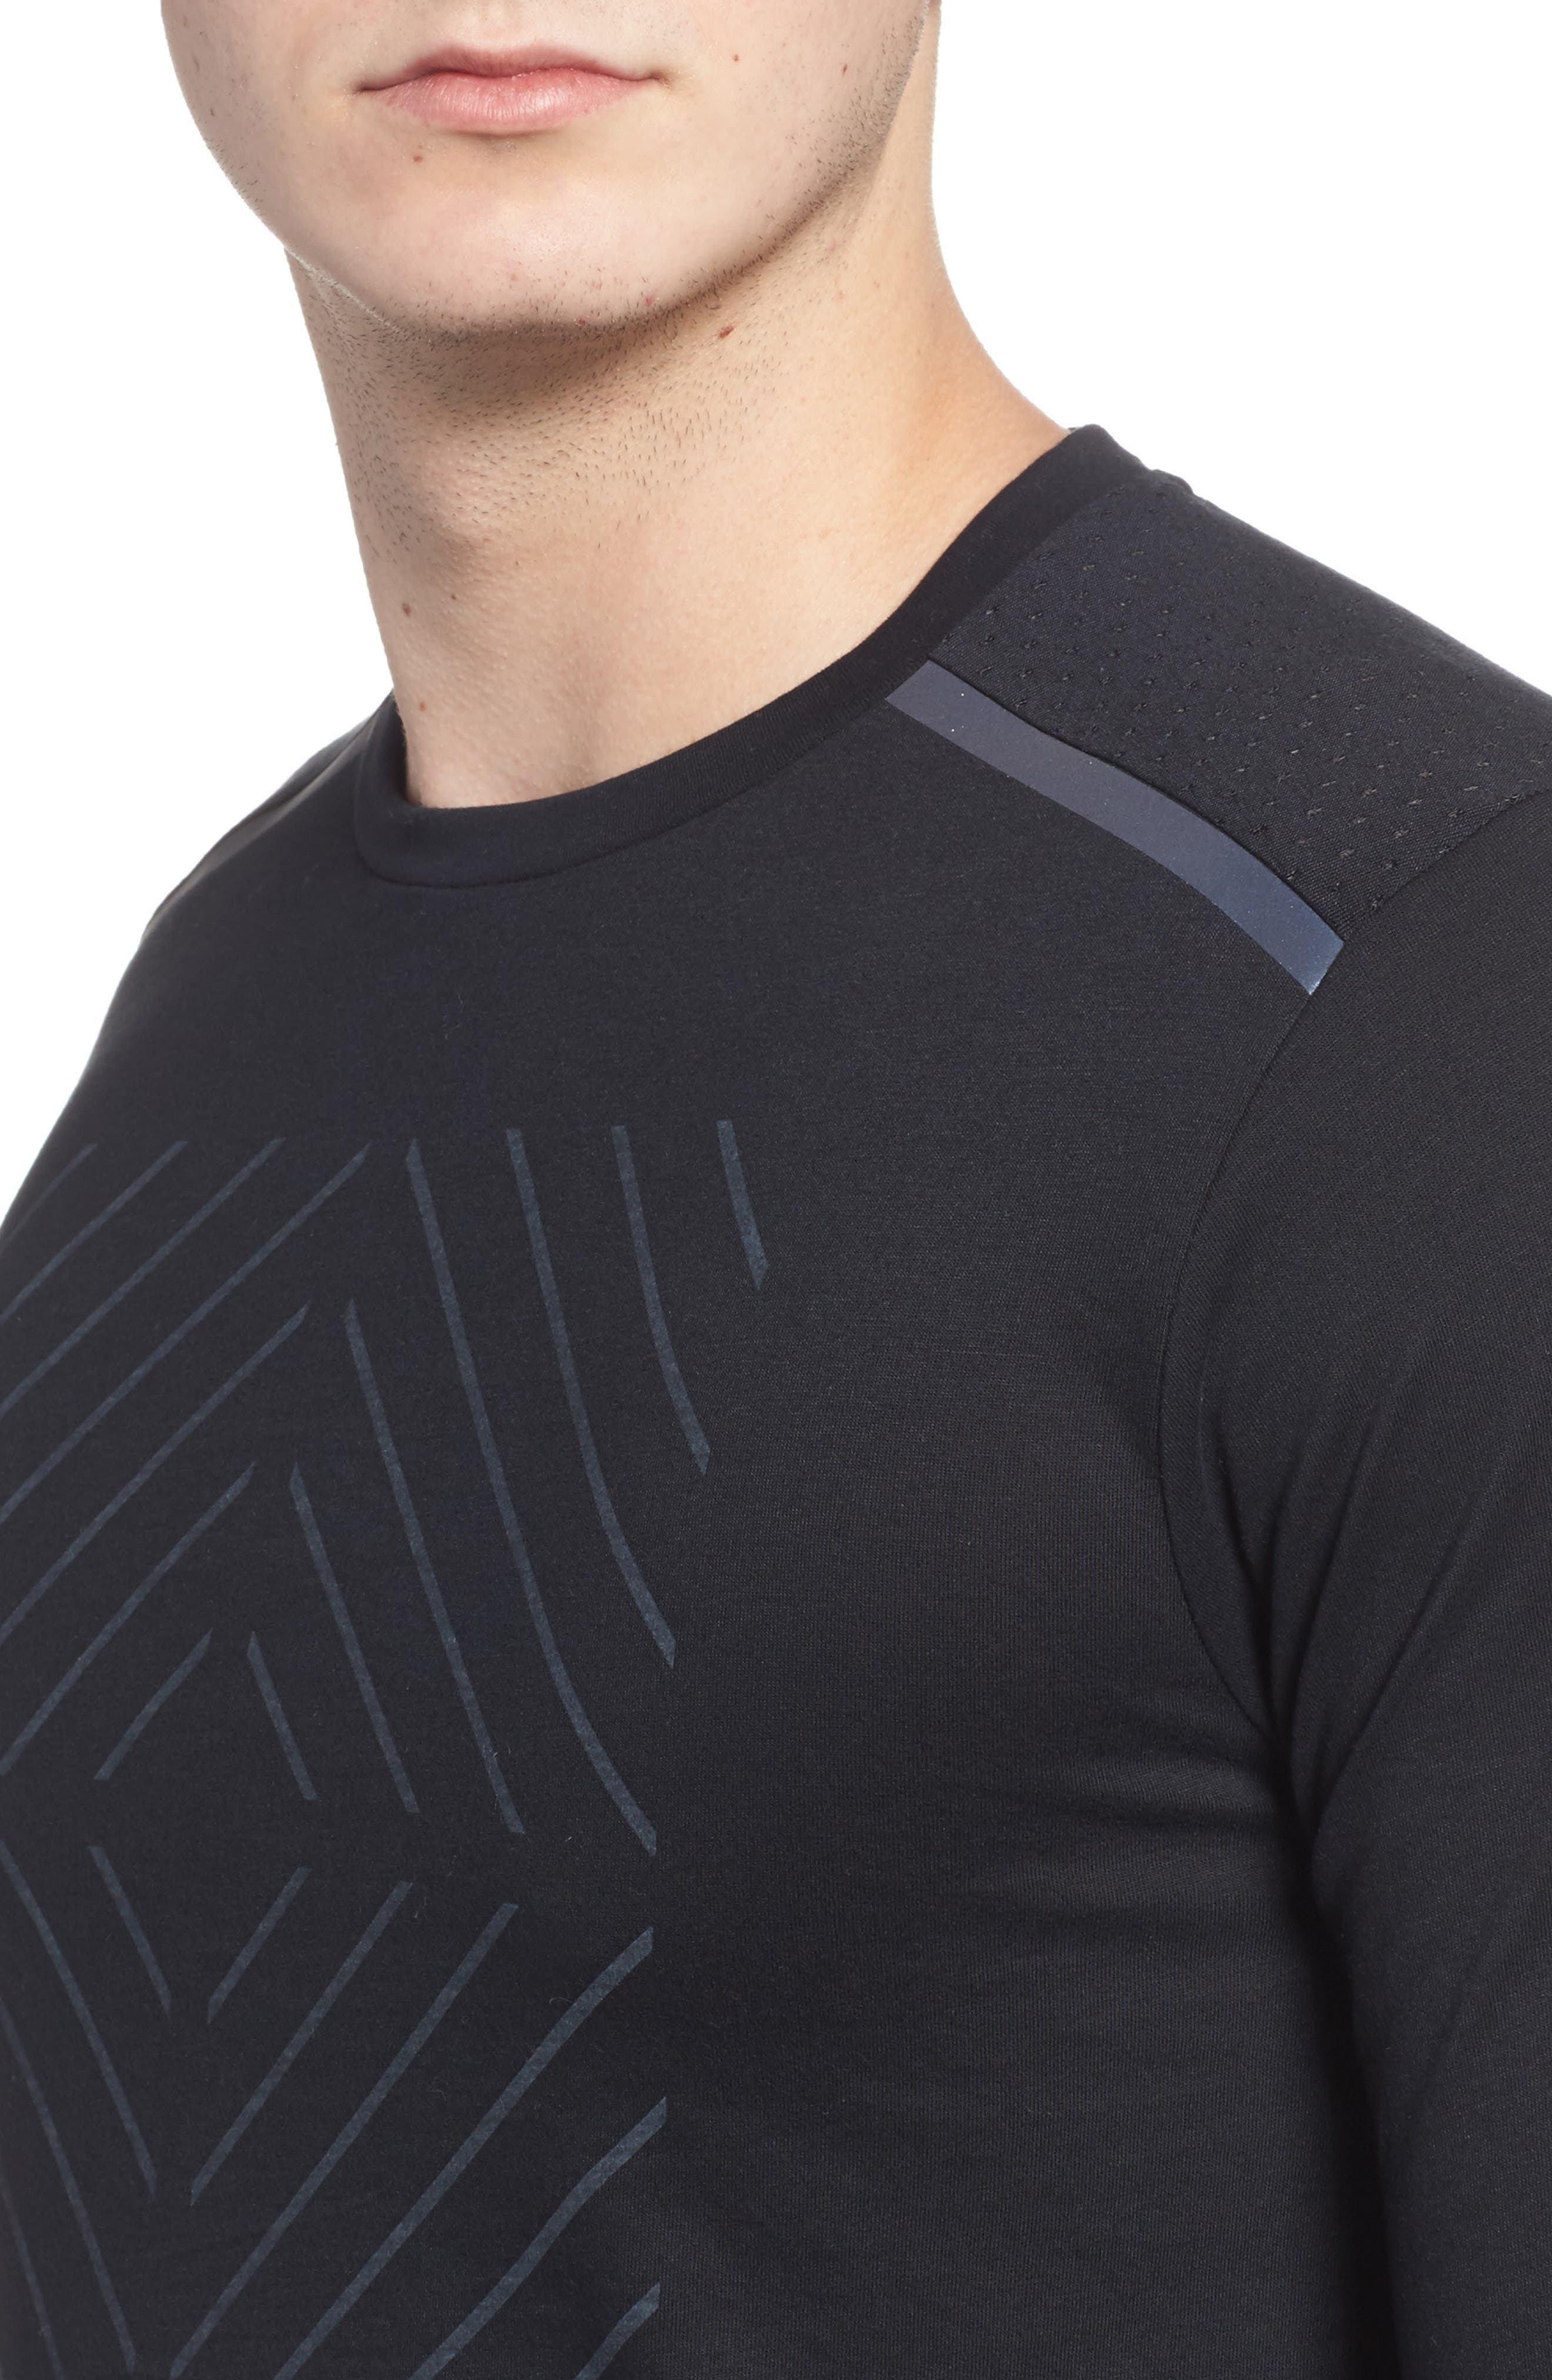 Tailwind Long Sleeve Running T-Shirt,                             Alternate thumbnail 4, color,                             010